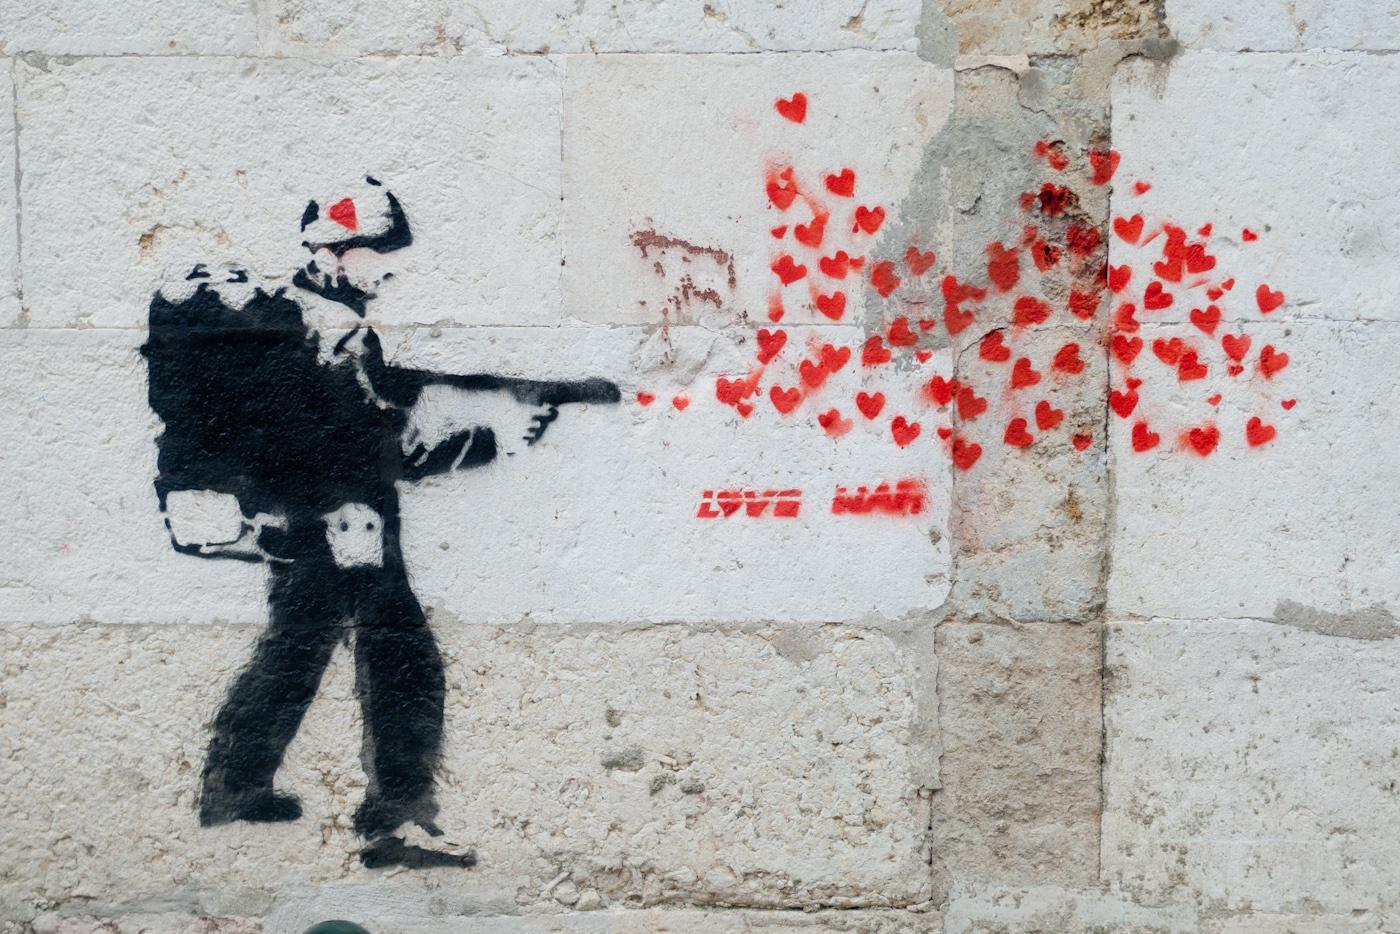 File:Love war (6405241535).jpg - Wikimedia Commons